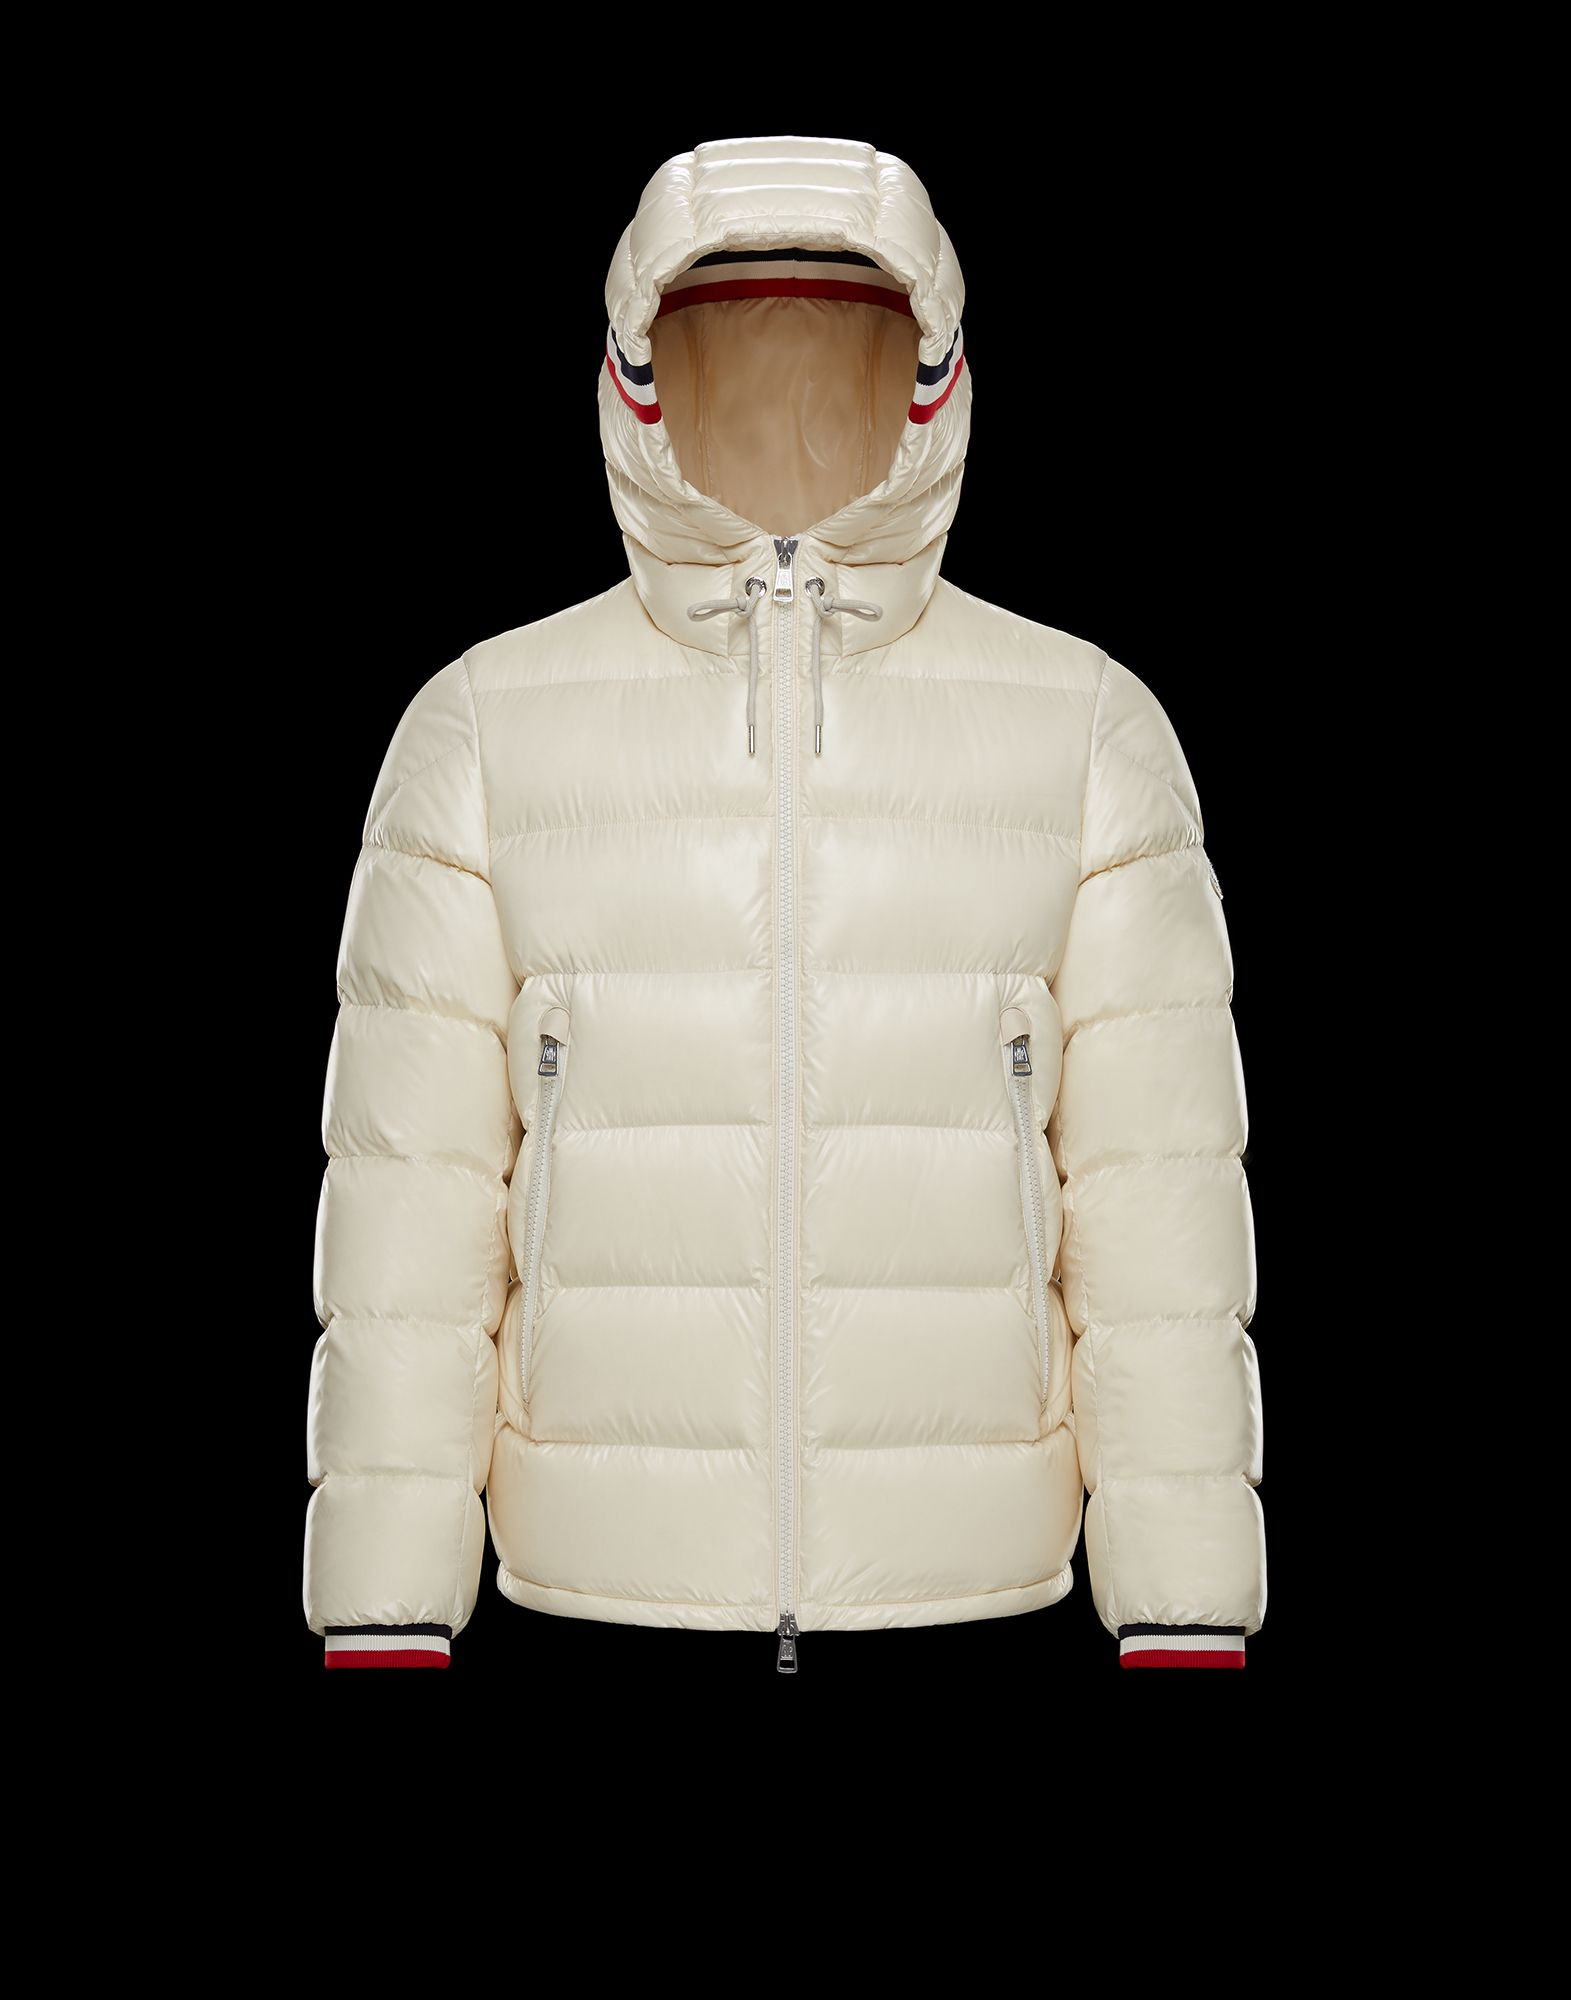 Pin by Rj Föreïgn on Winter Fashion Jackets, Moncler